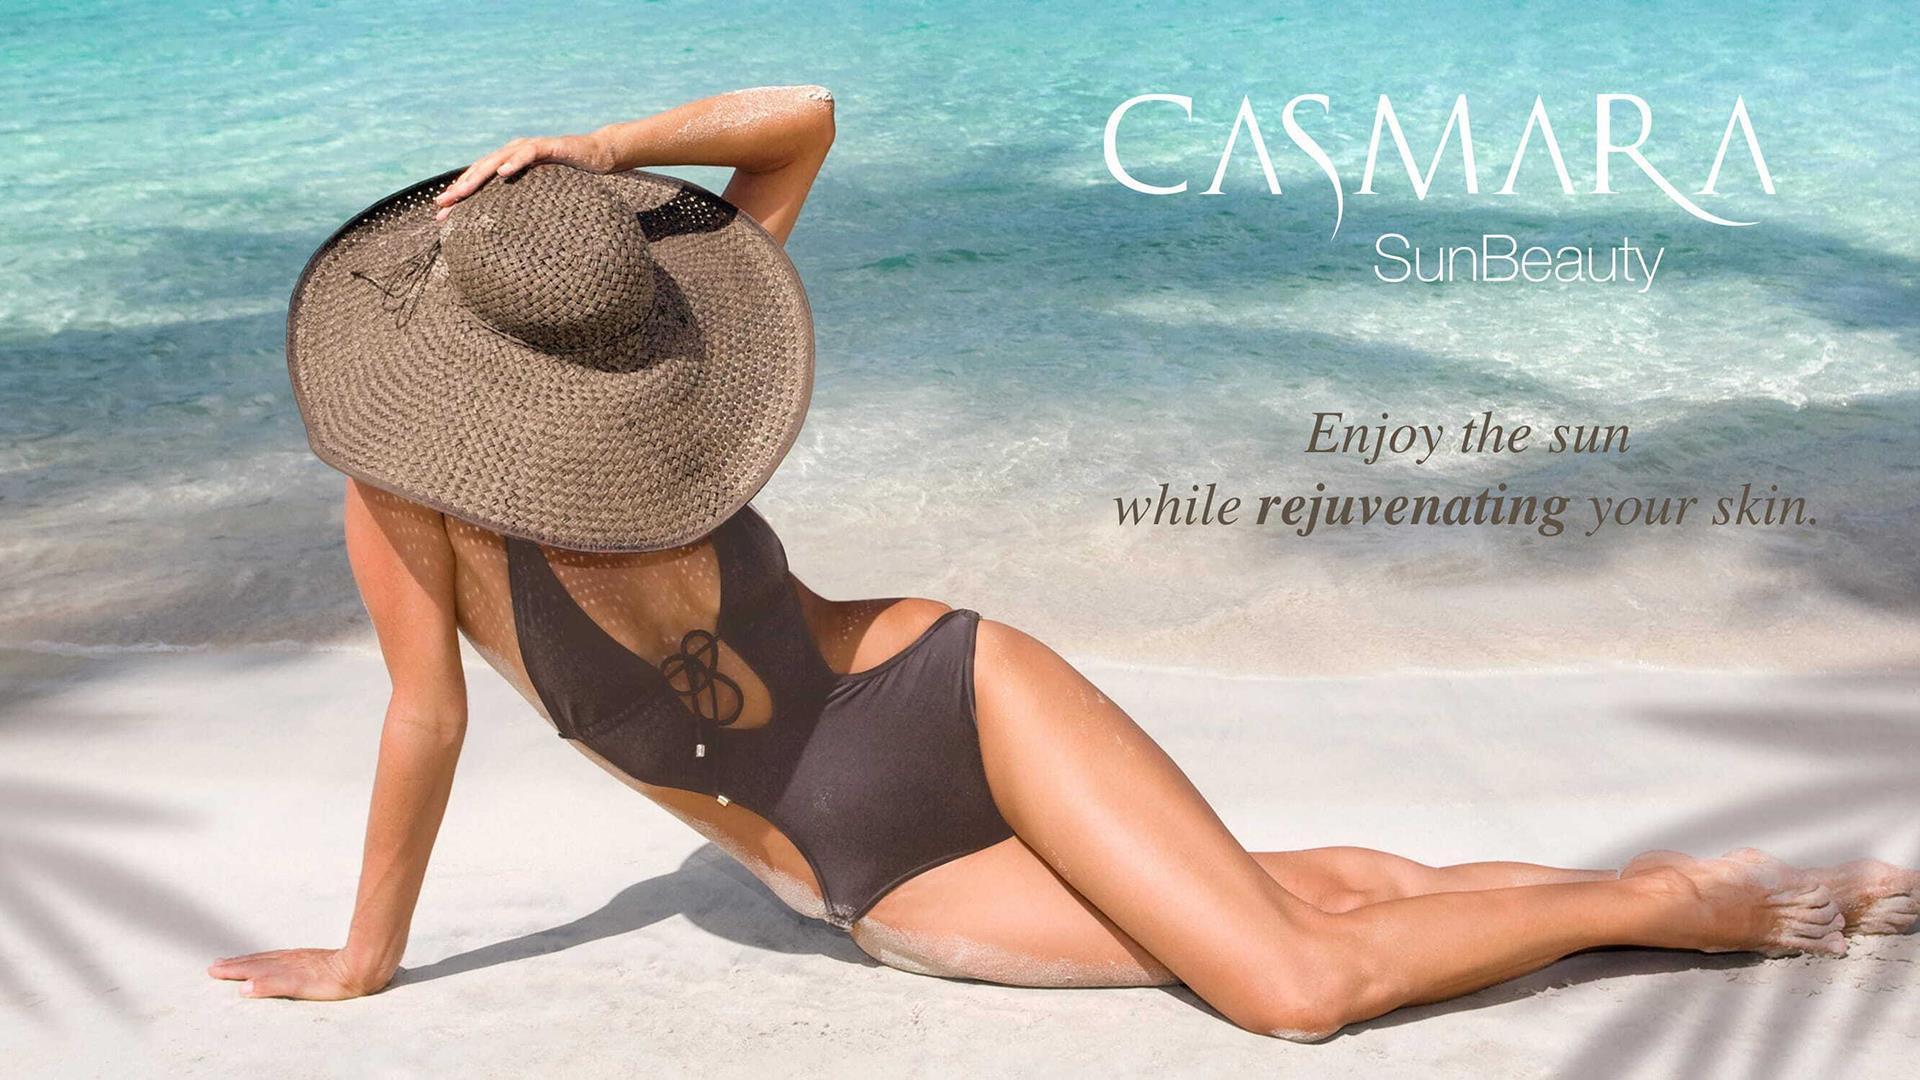 Sun Beauty - Enjoy the sun while rejuvenating your skin